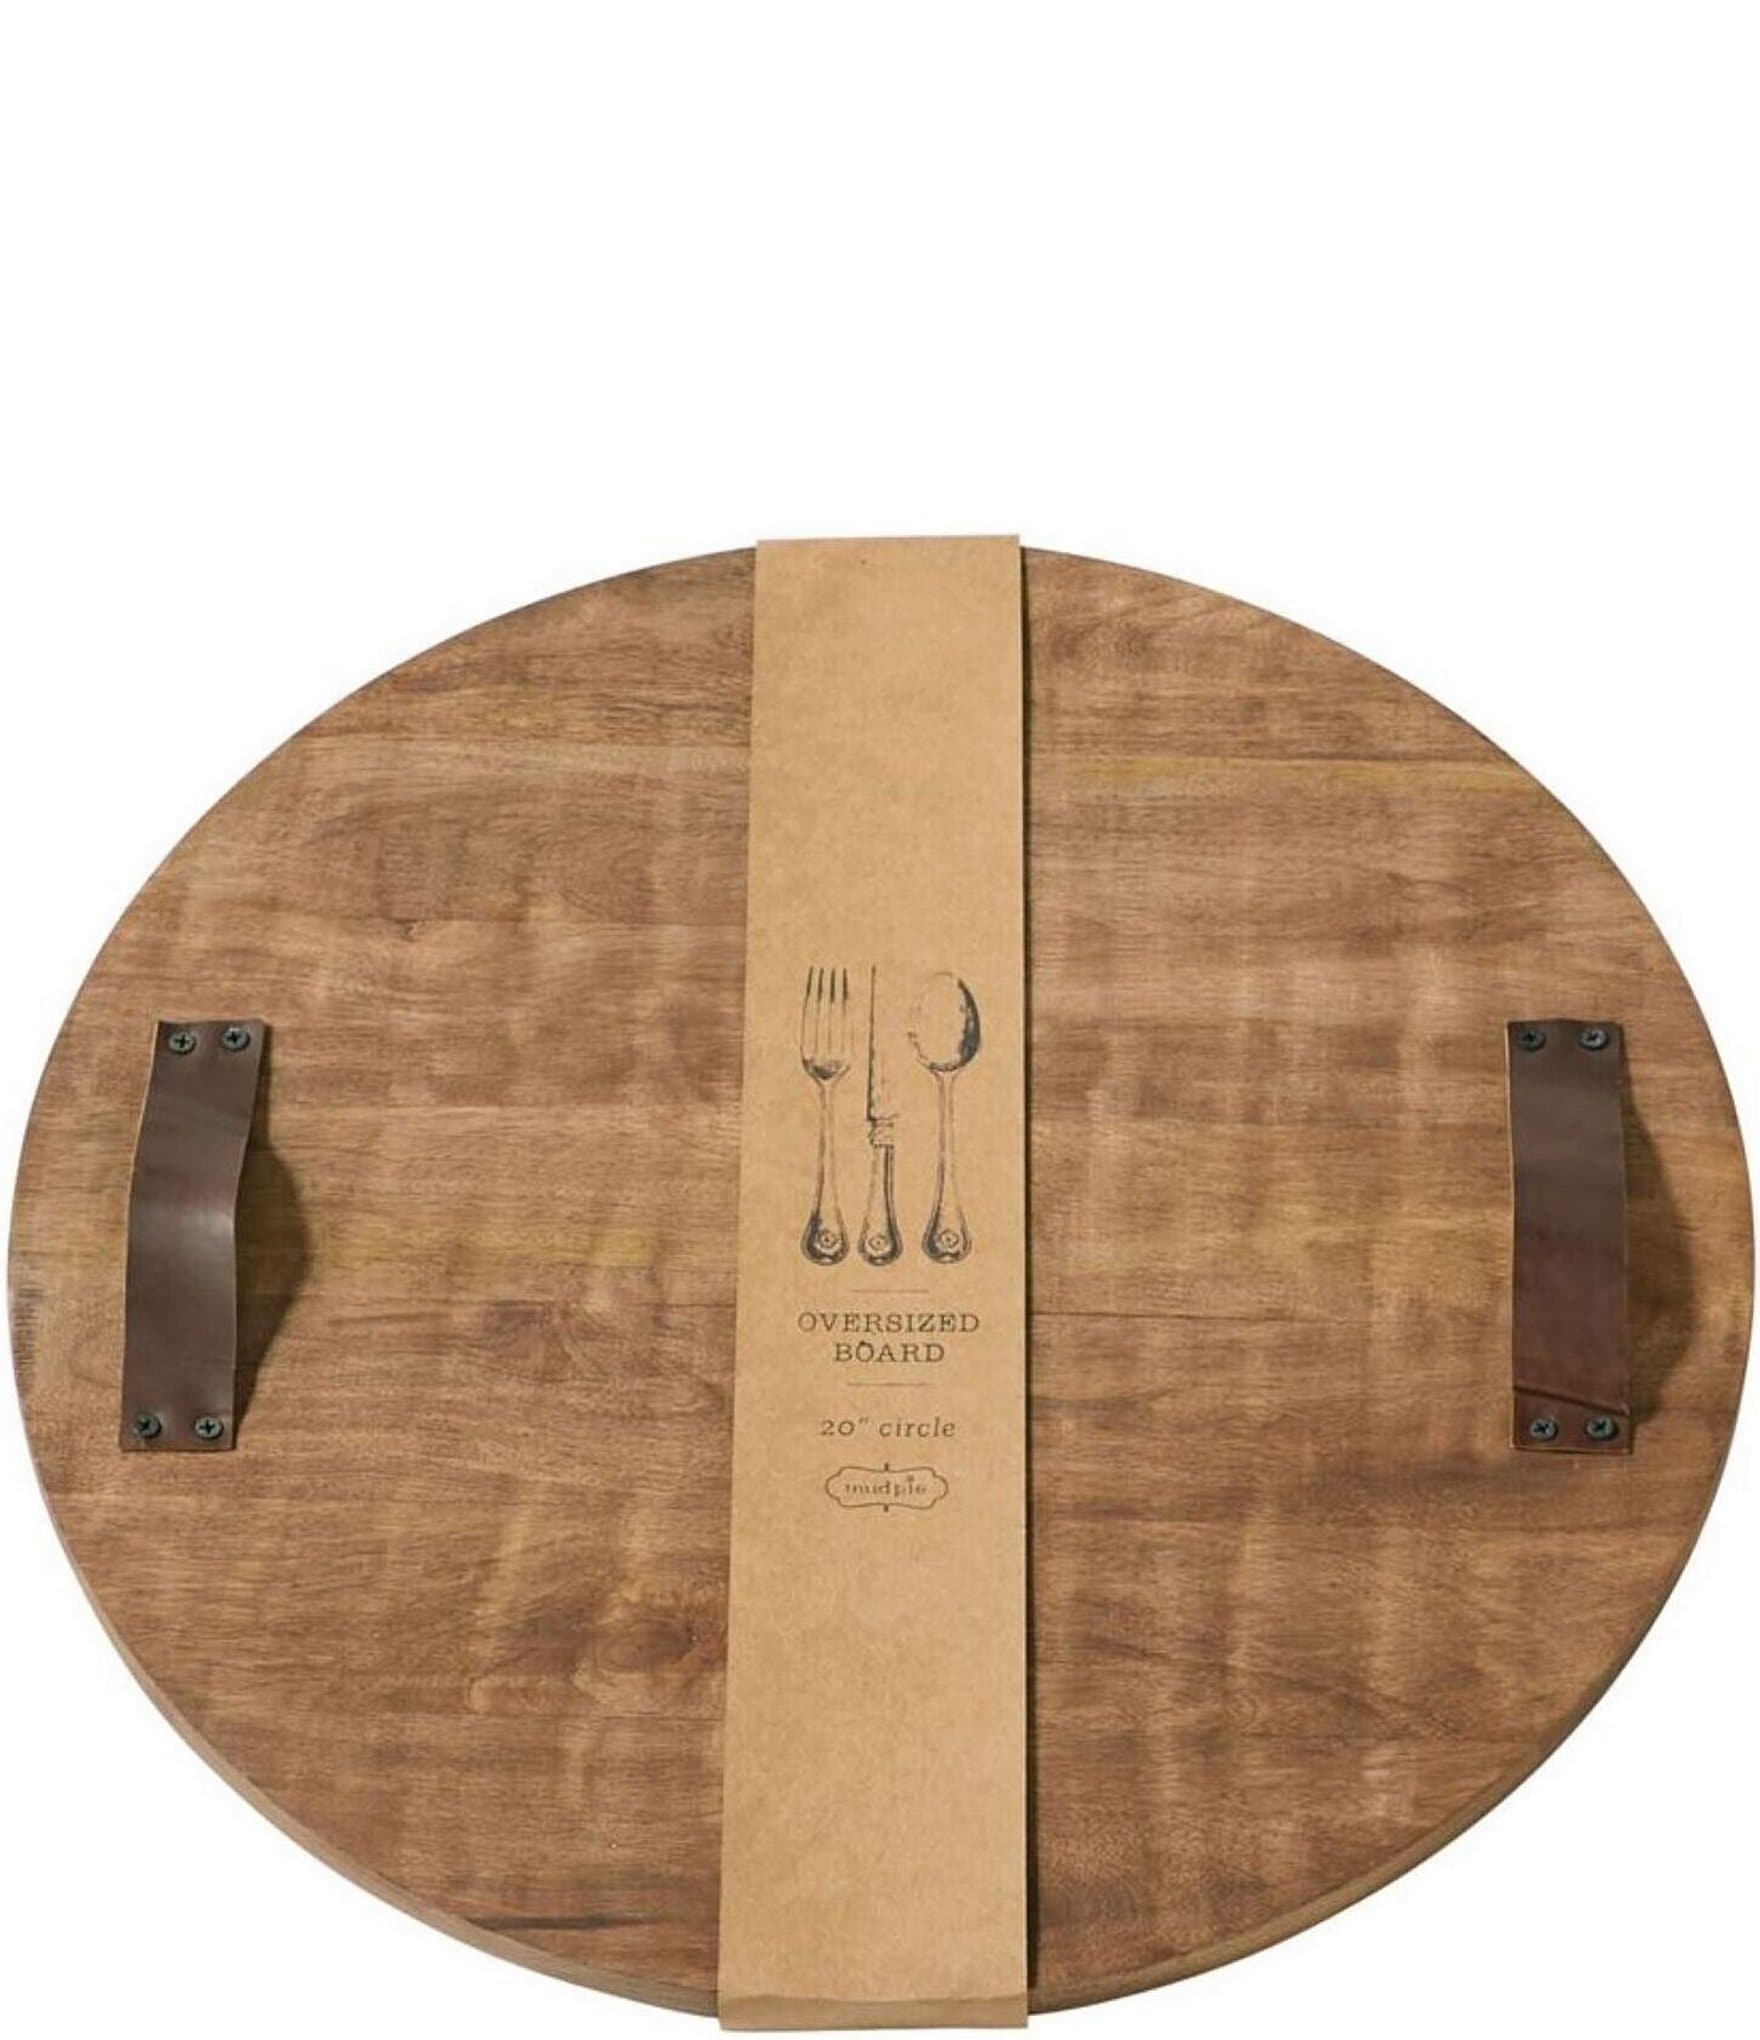 Mud Pie Quatrefoil Wood Board